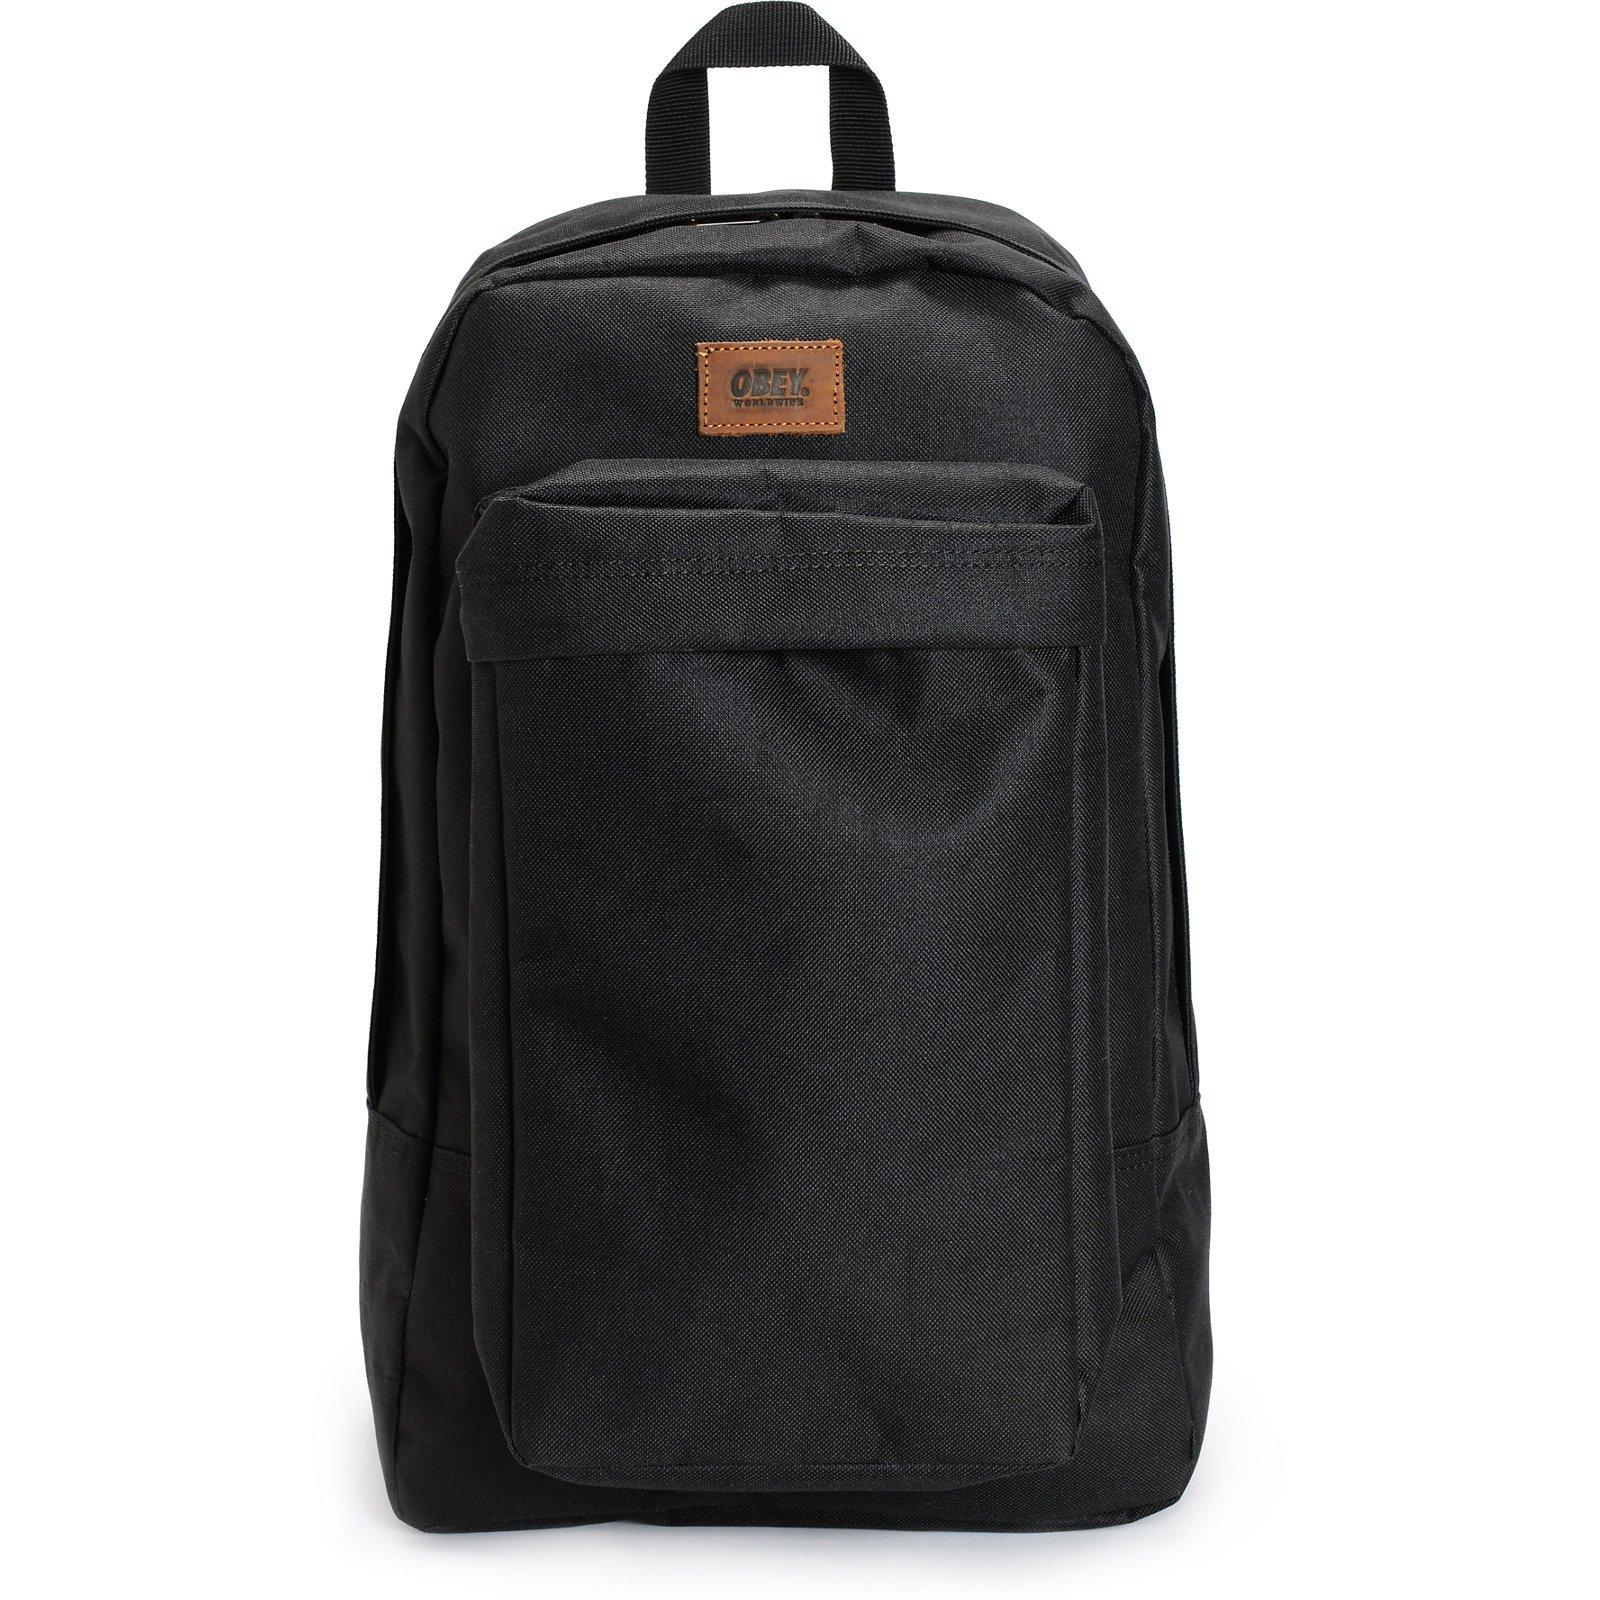 Obey Everett Backpack Daypack Black